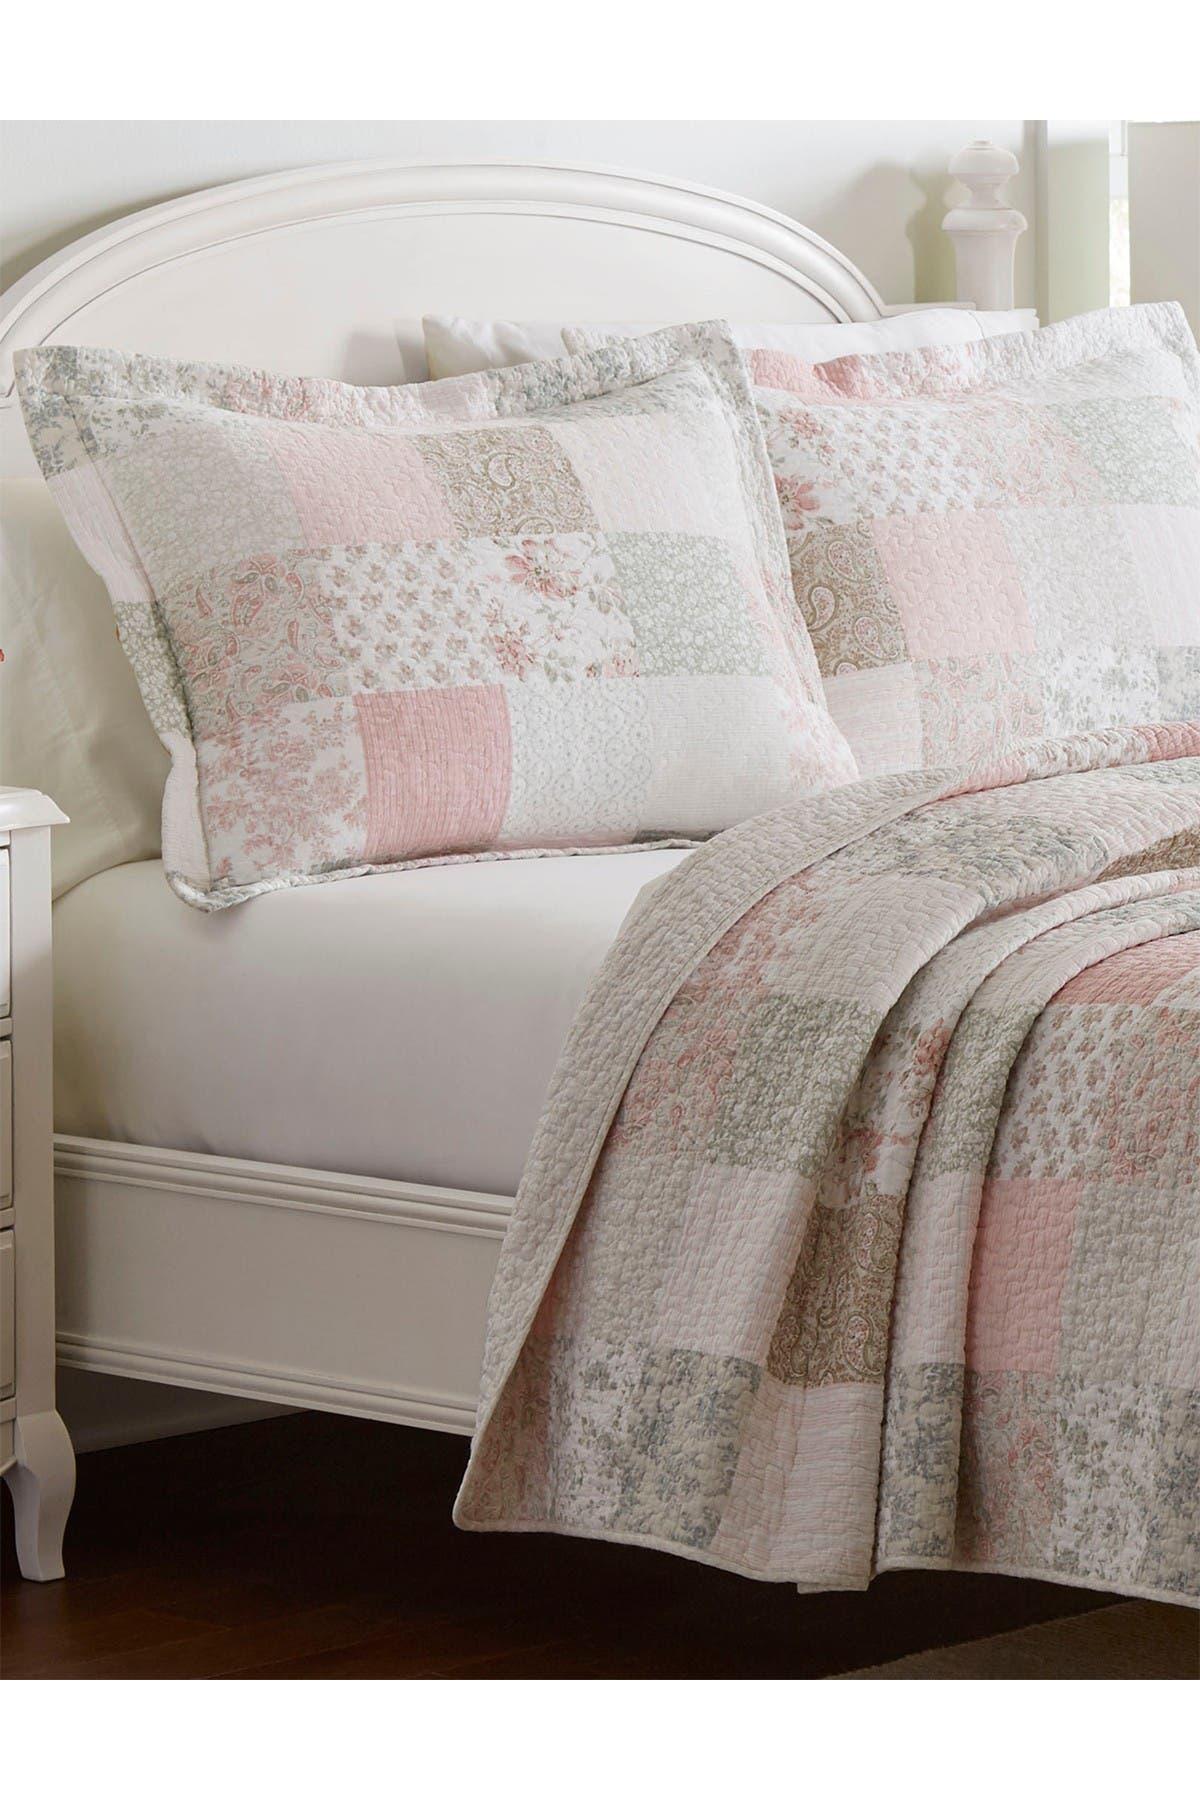 Laura Ashley Celina Patchwork Pastel Pink Full Queen Quilt Set Nordstrom Rack